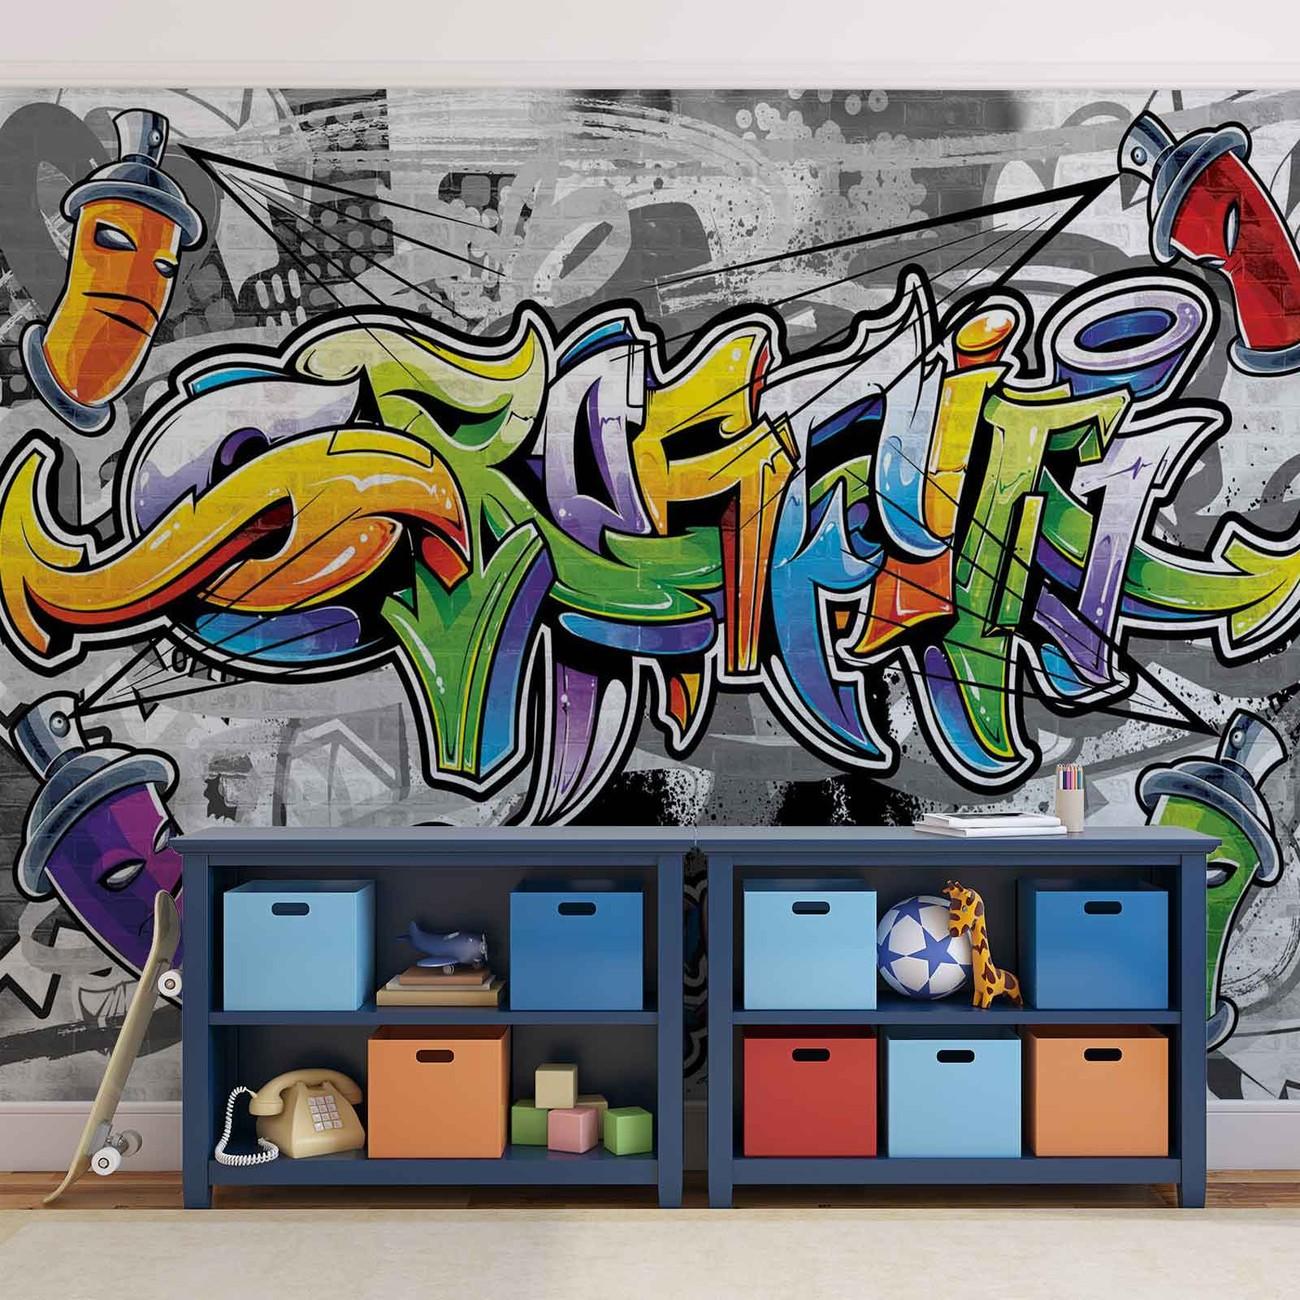 Graffiti art wallpaper for walls - Graffiti Street Art Wallpaper Mural Facebook Google Pinterest Price From